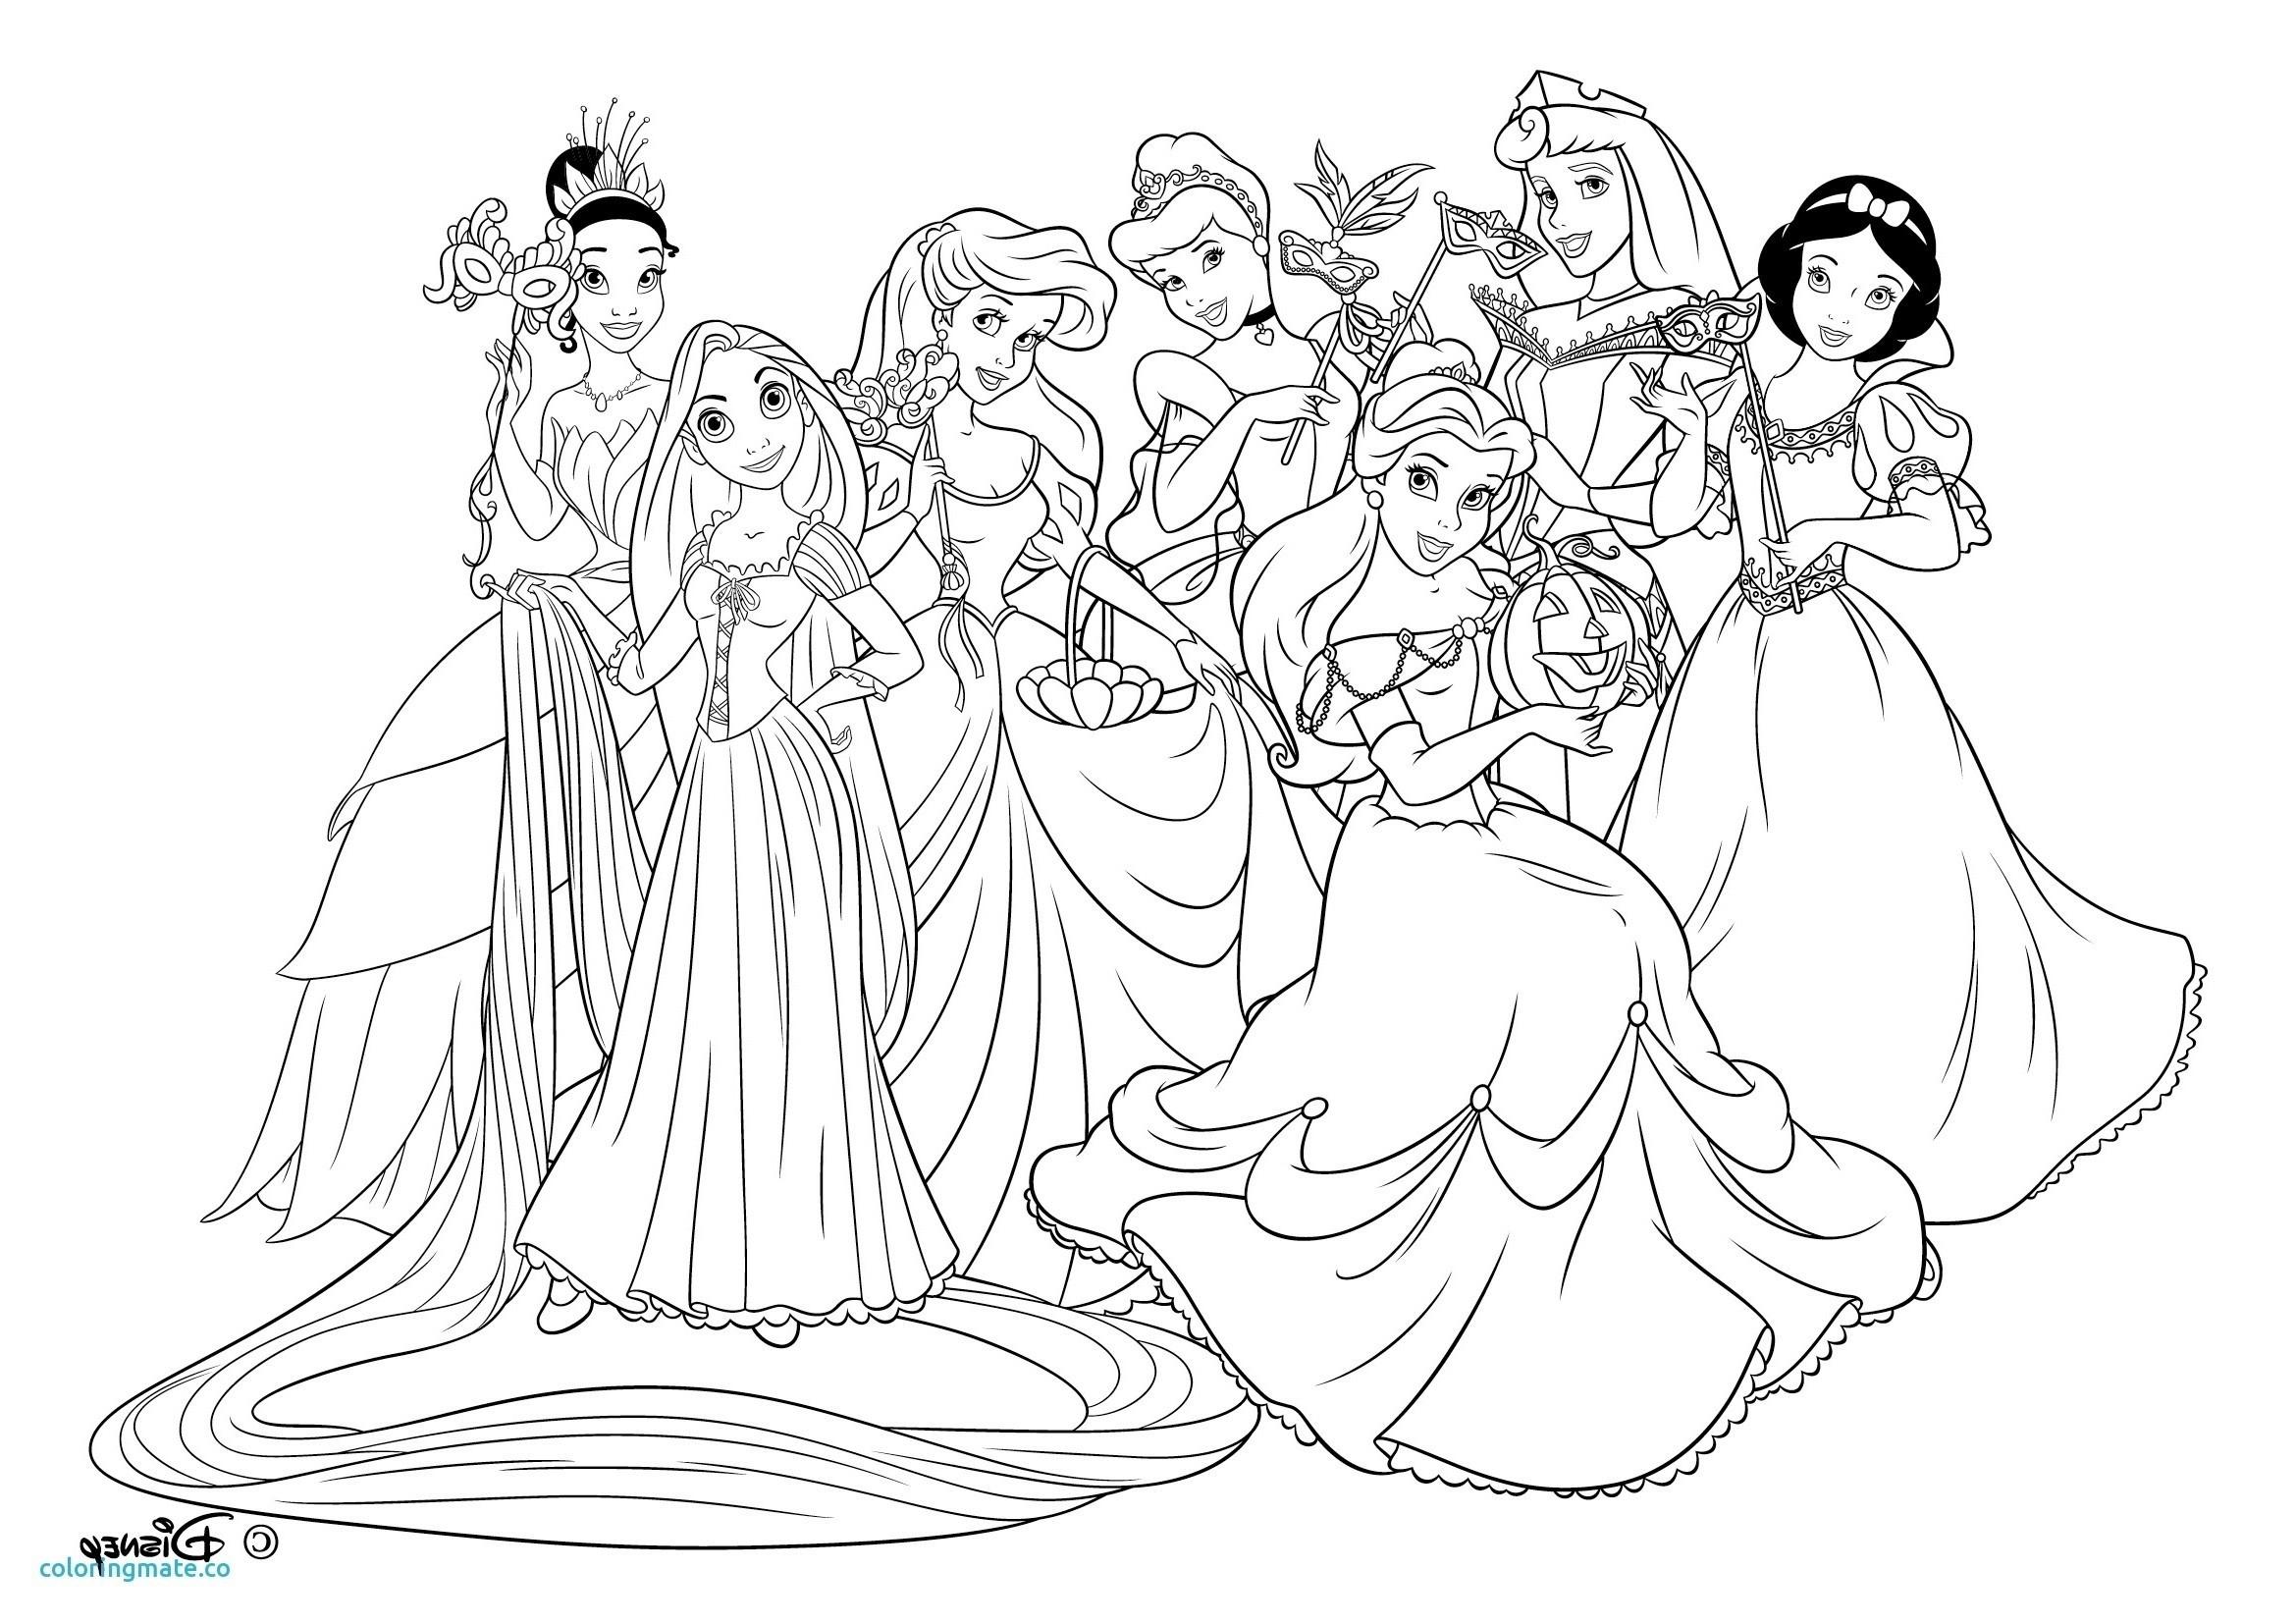 Coloriage Princesse Disney - Delightdomain destiné Coloriage Princesses Disney À Imprimer